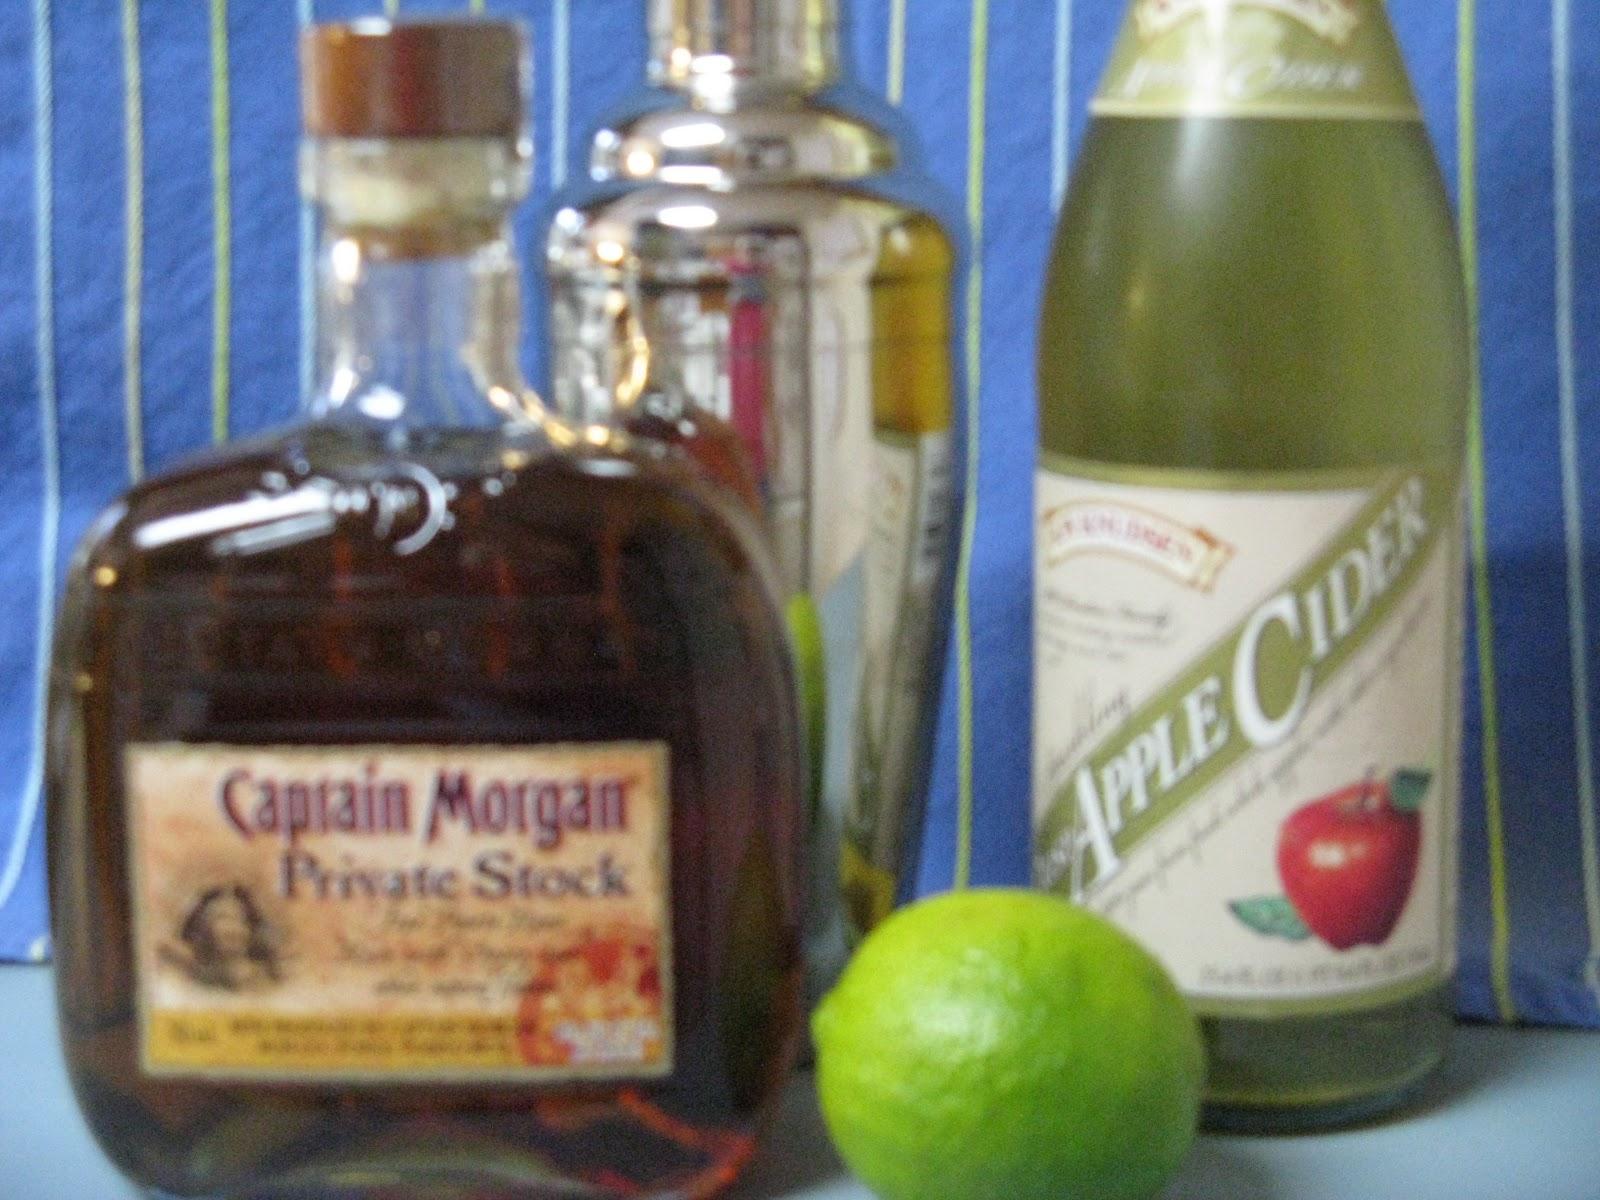 A Taste of Alaska: Hard Spiced Apple Cider